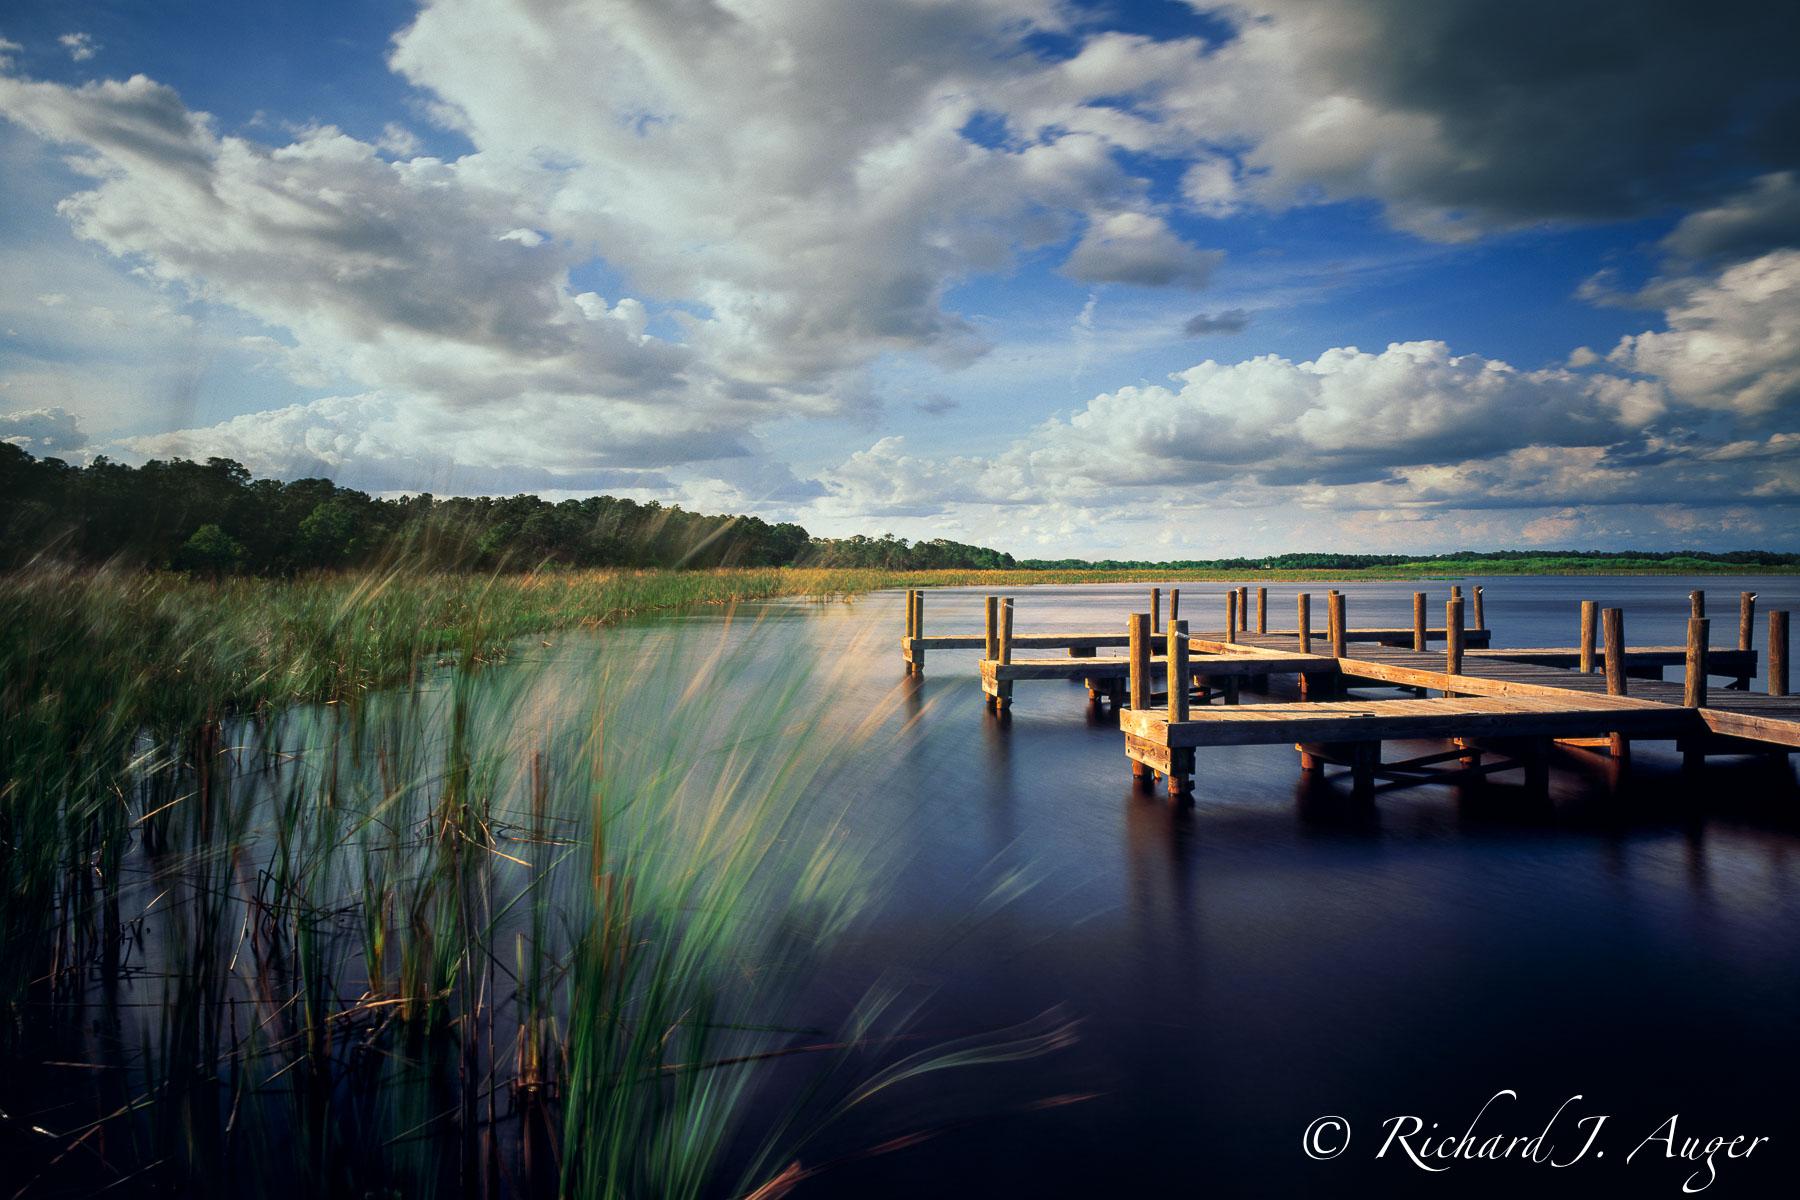 Moss Park, Orlando, Florida, swamp, dock, grass, water, dark, clouds, park, photograph